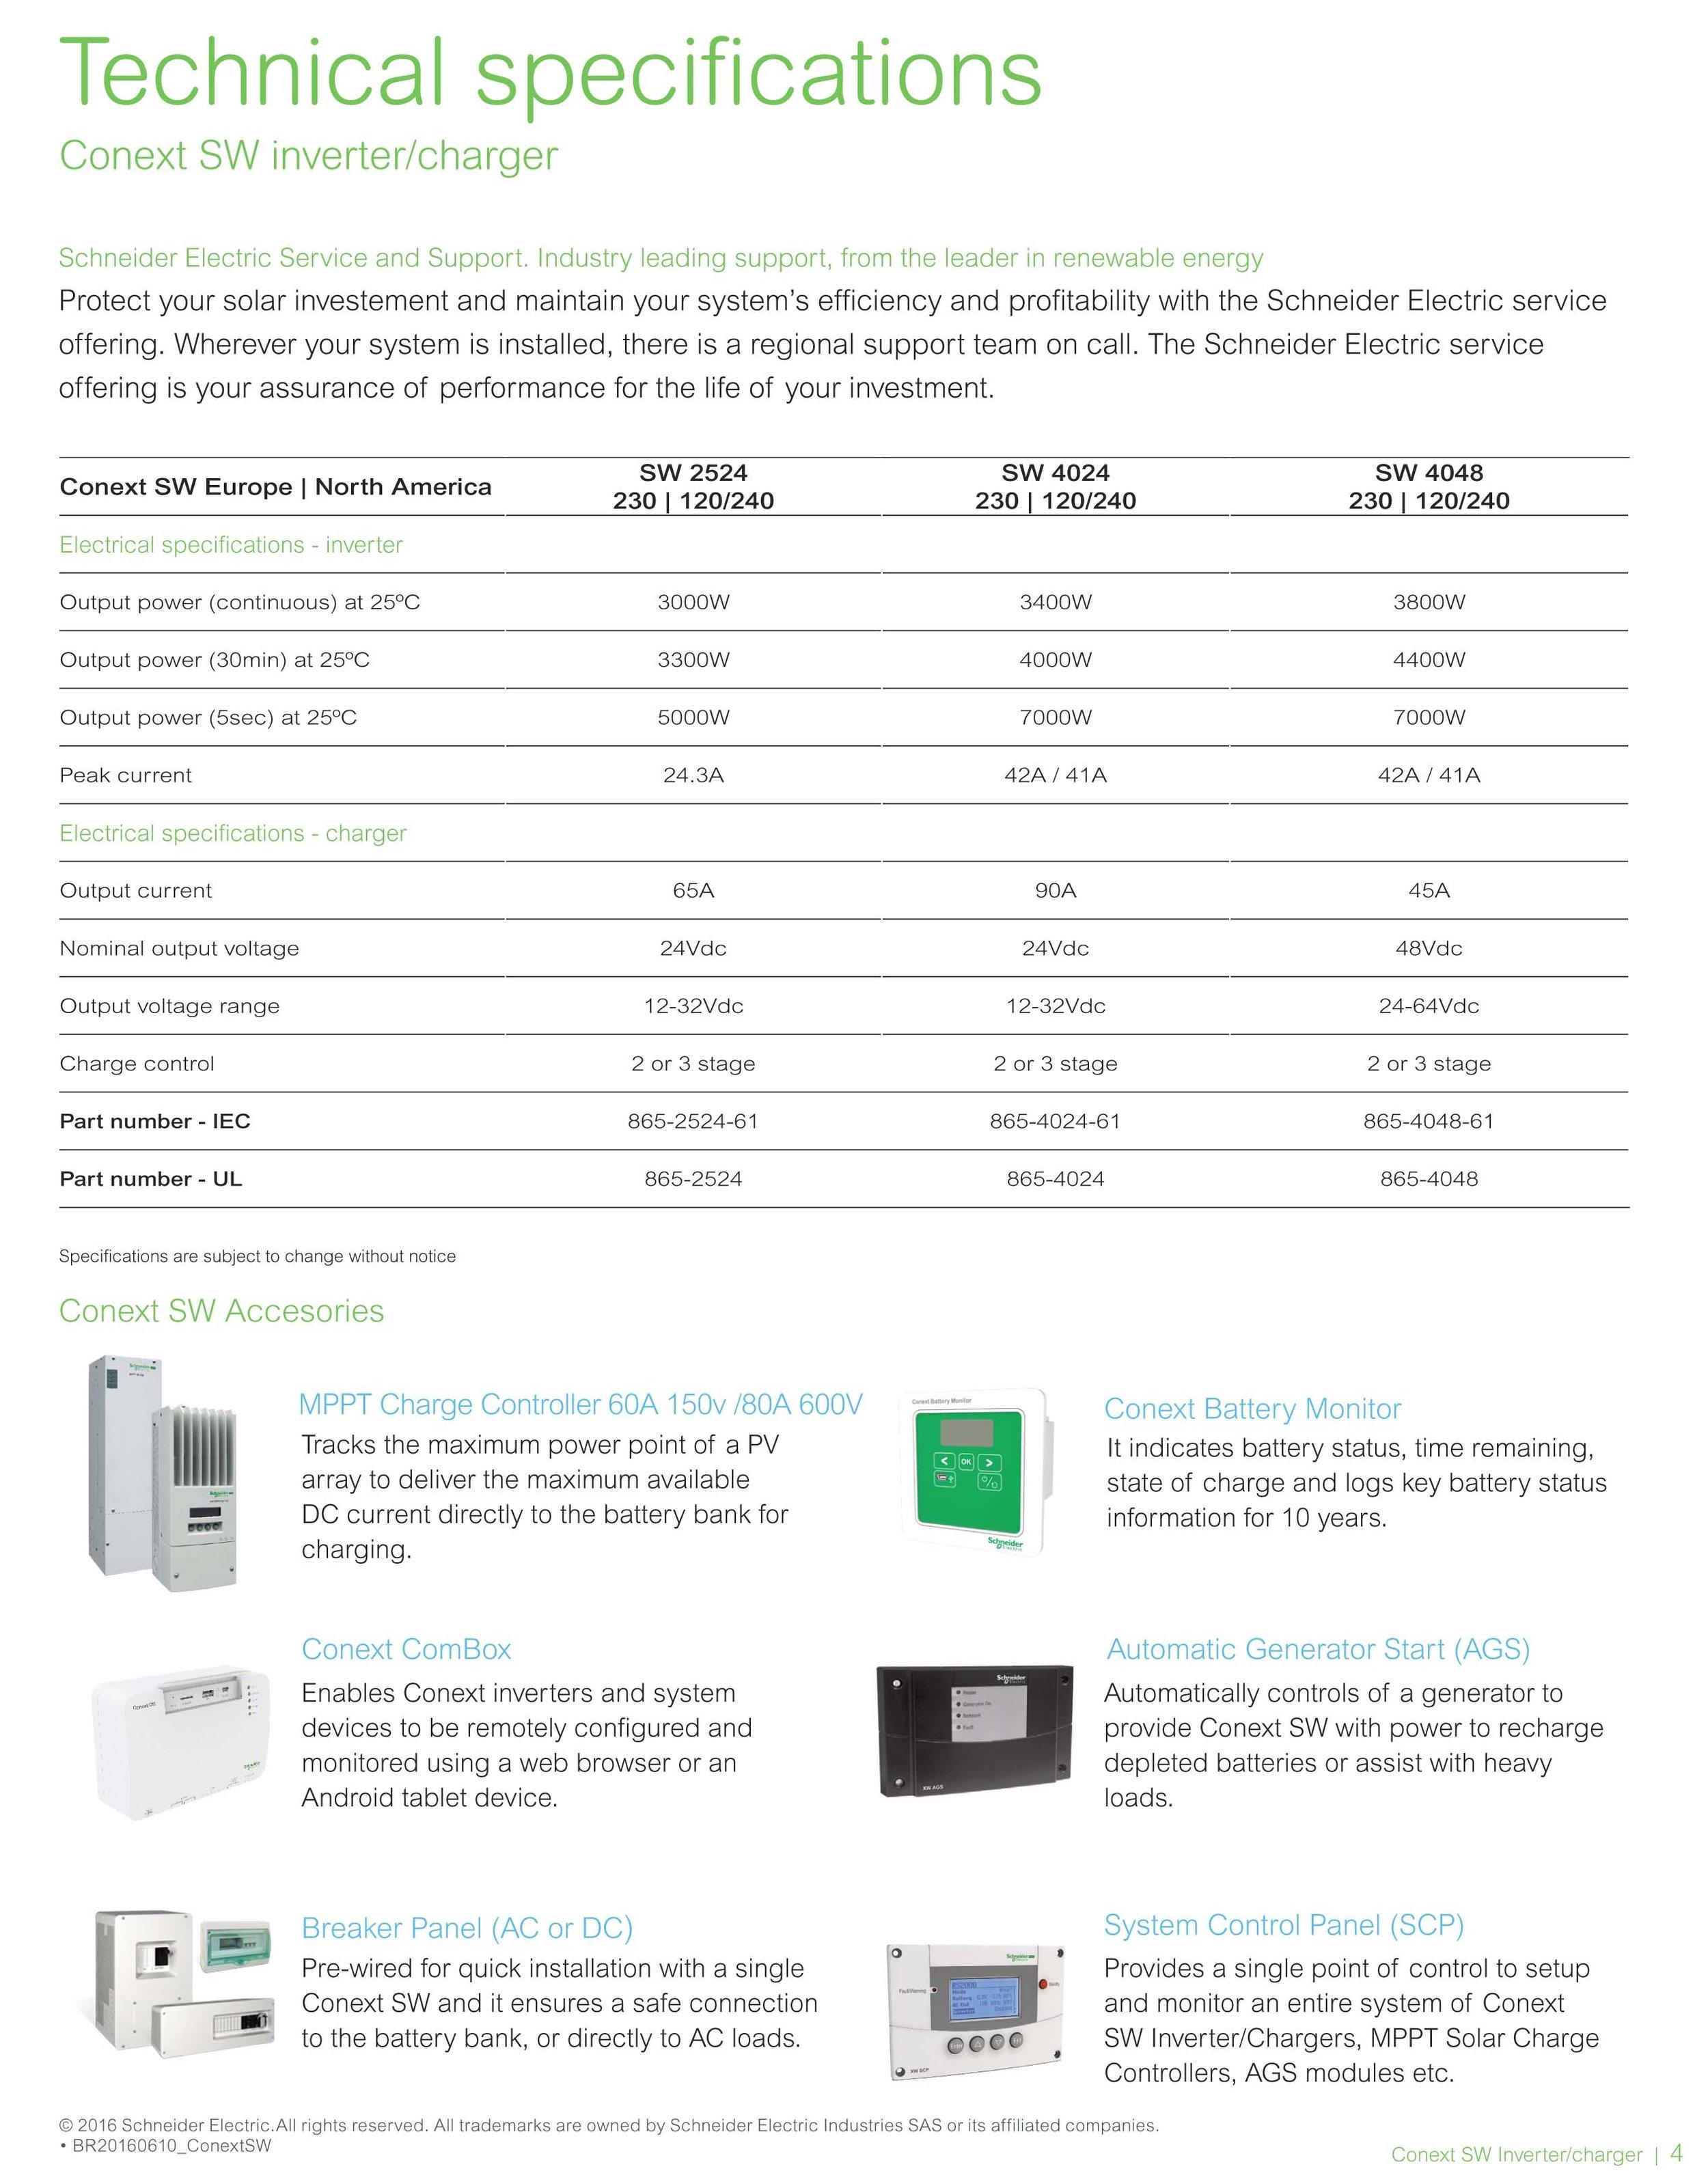 conext-sw-brochure-20160620-4.jpg